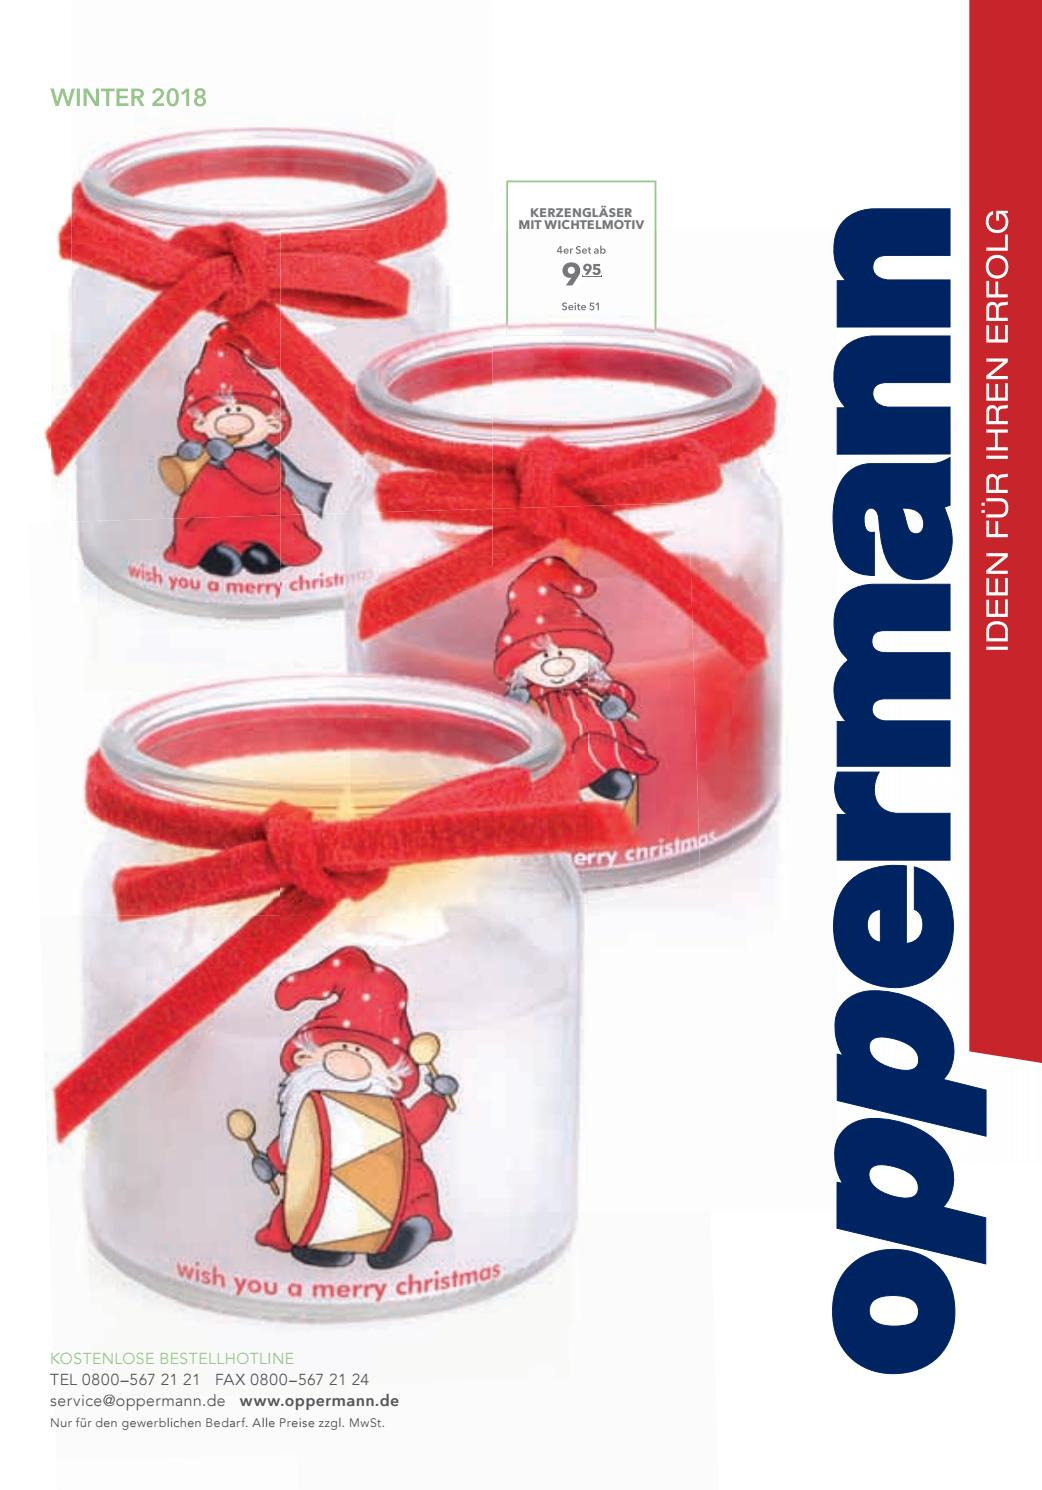 Oppermann Katalog Winter 2018 by HACH KG issuu